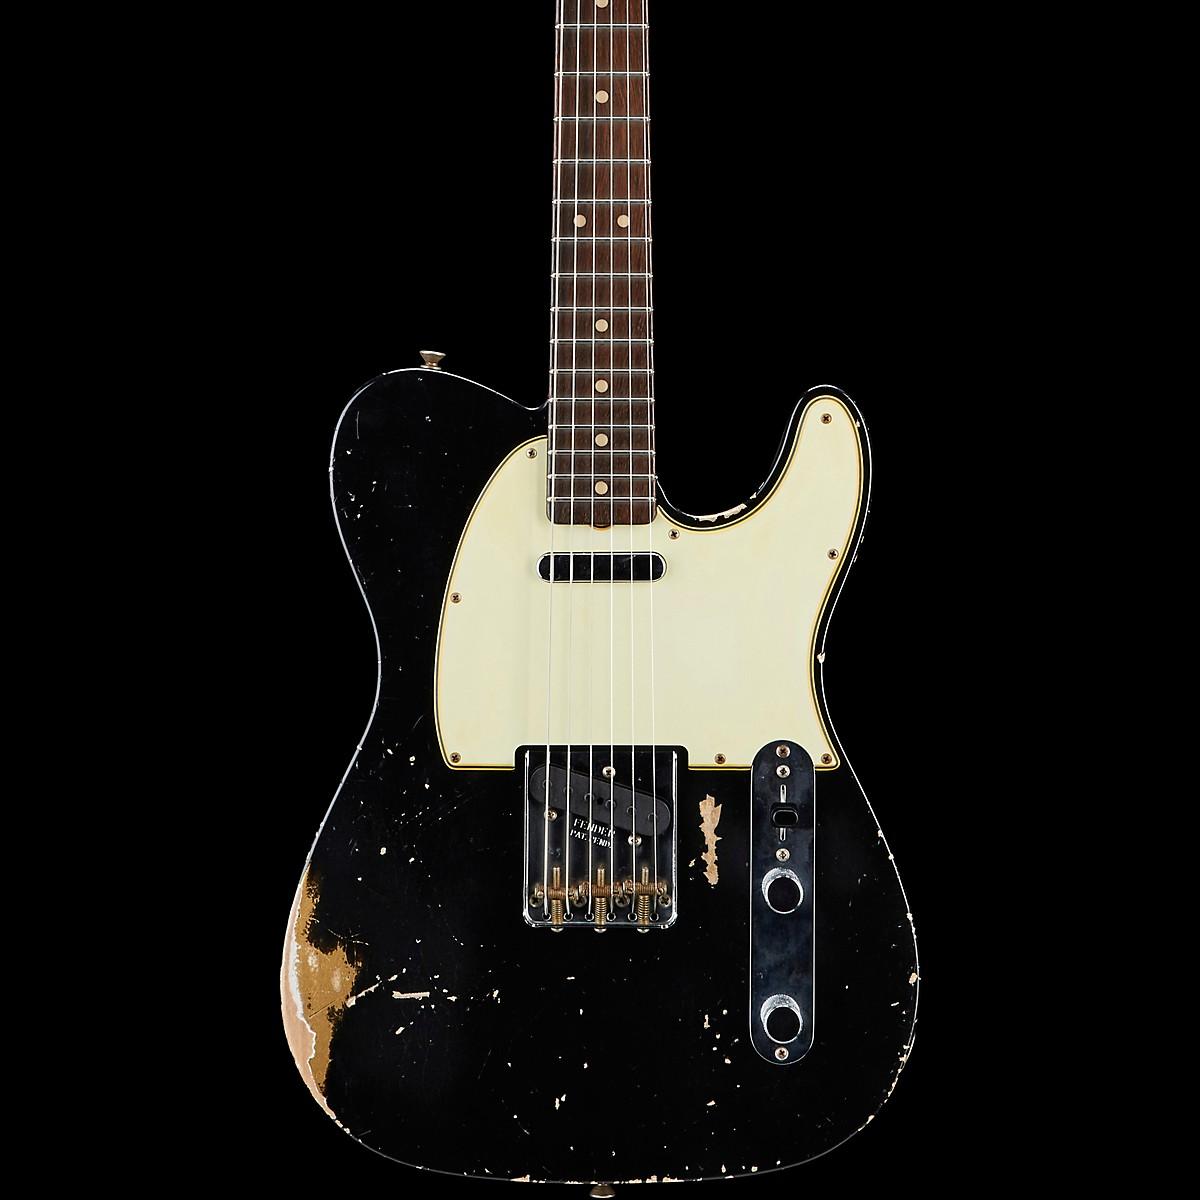 Fender Custom Shop Masterbuilt Dennis Galuszka '60s Telecaster Relic Brazilian Rosewood Neck Electric Guitar